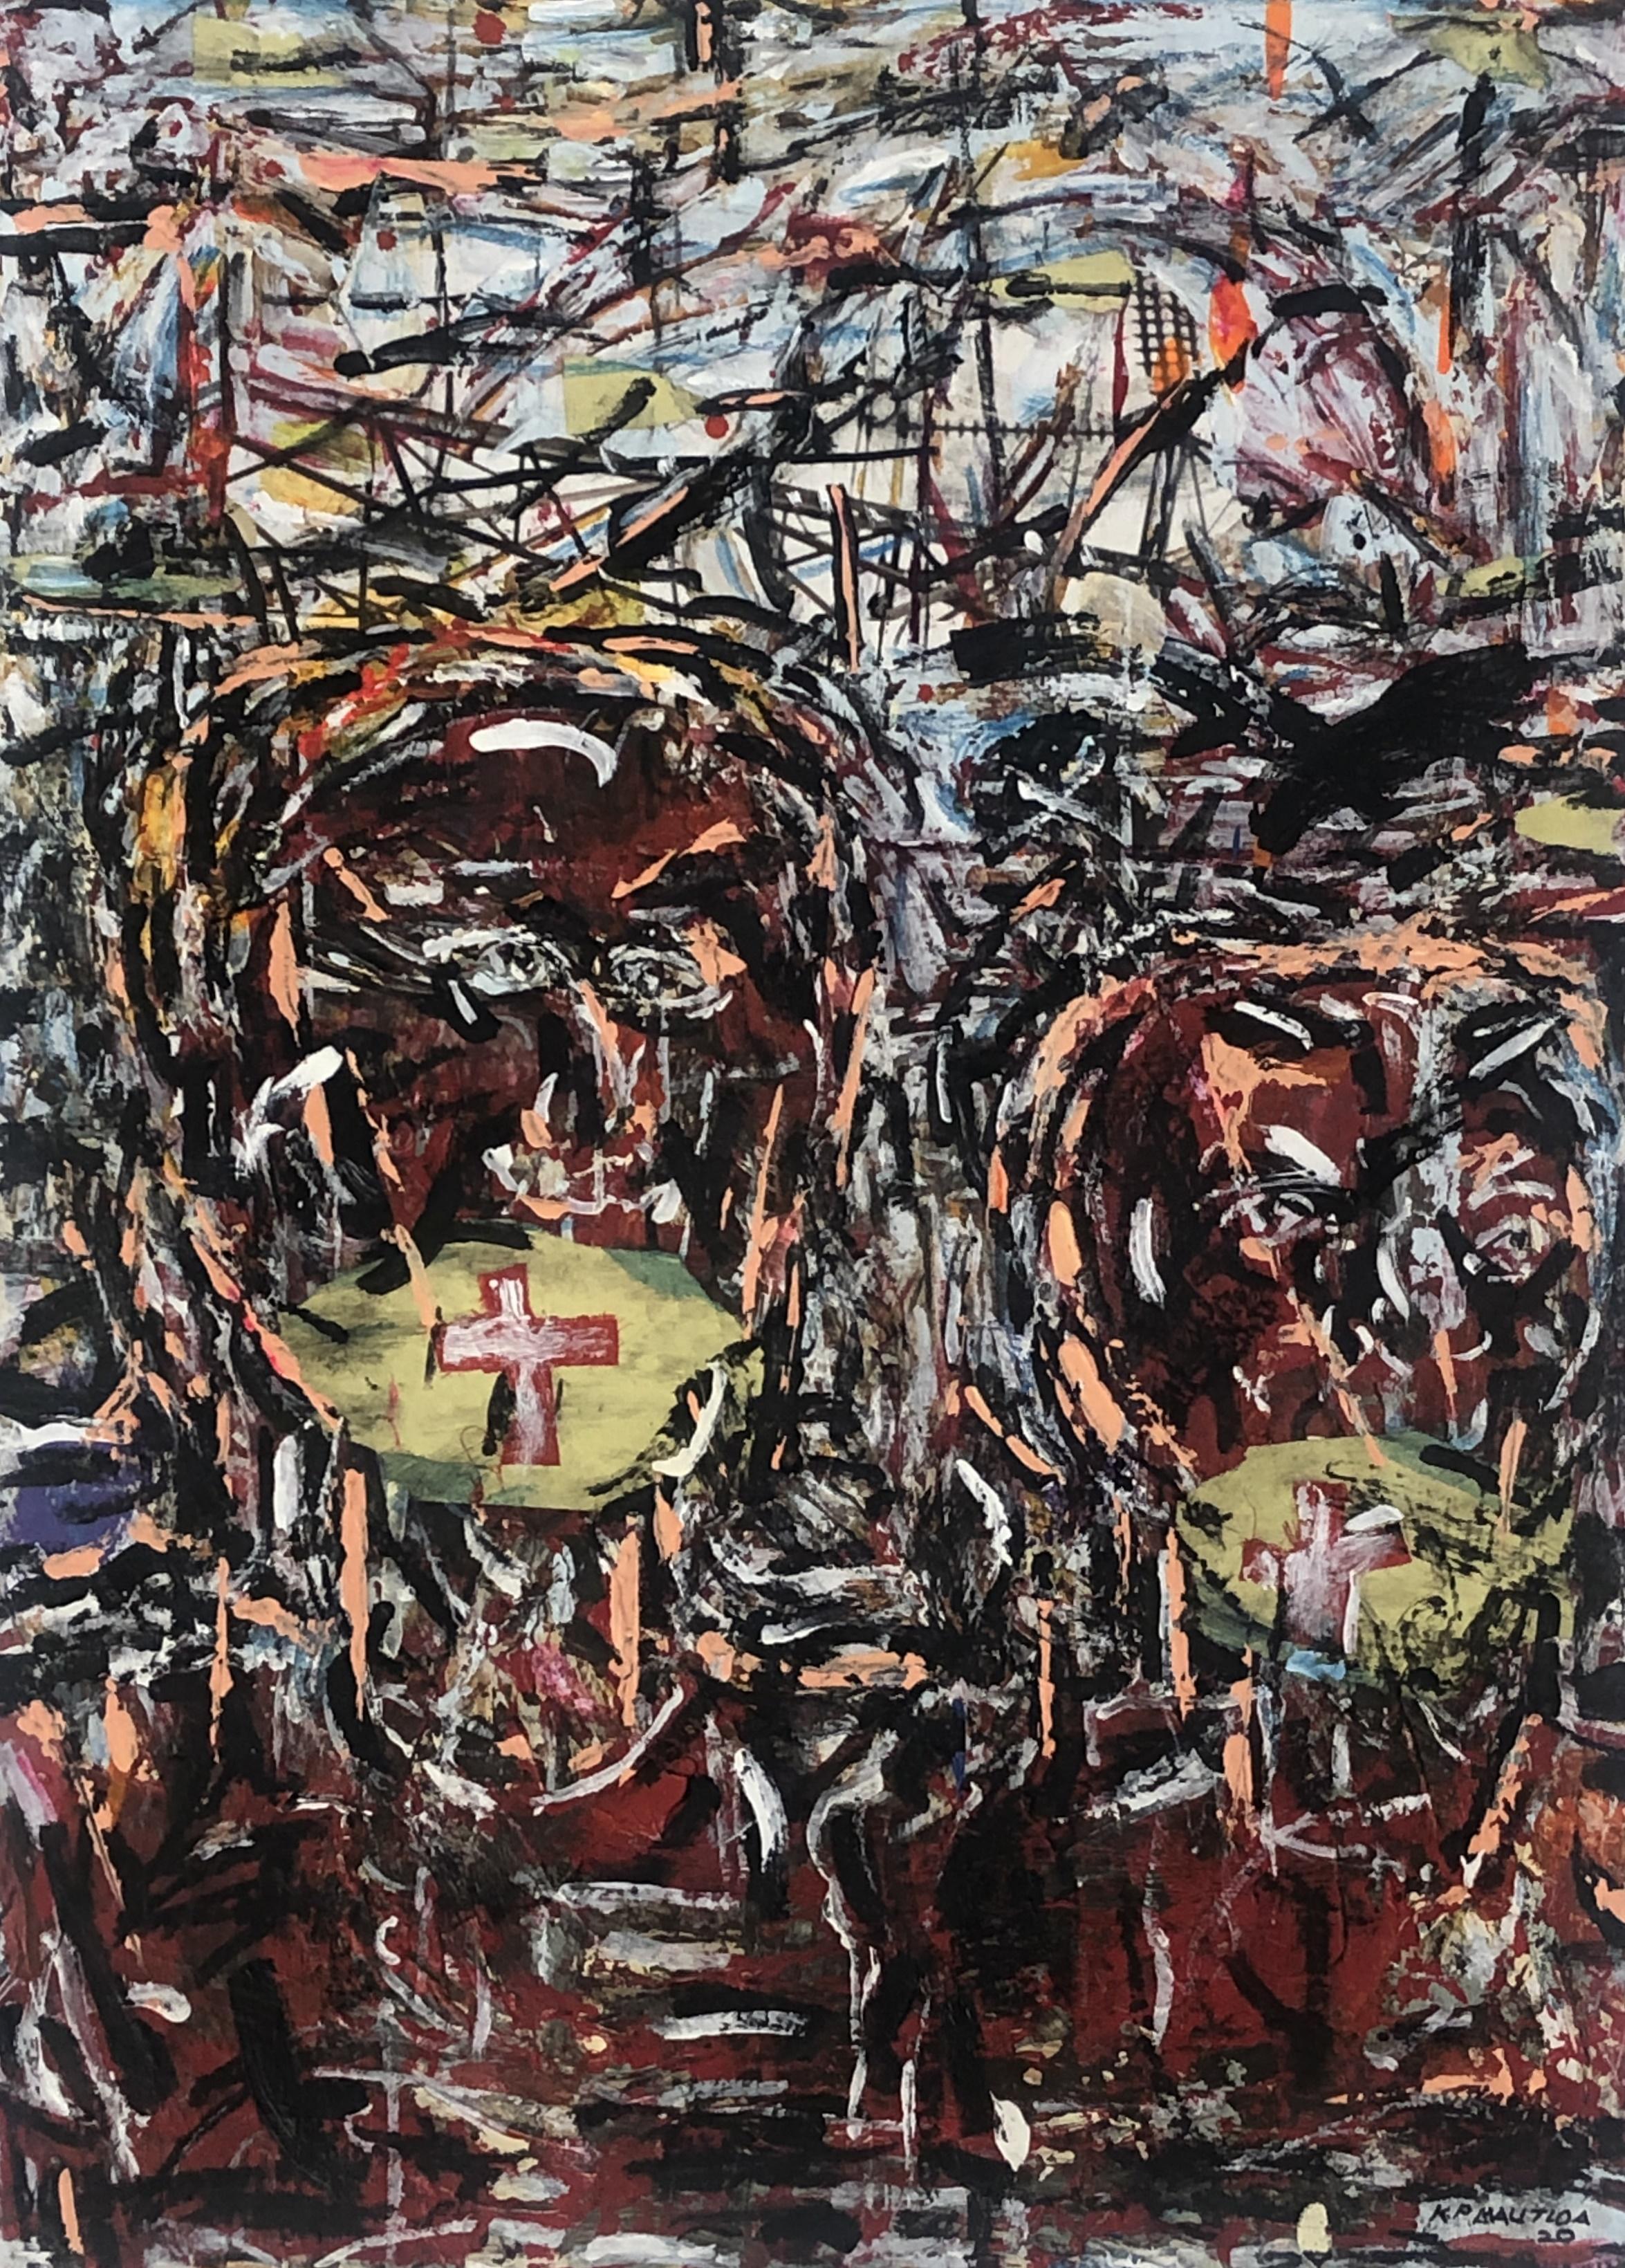 Pat Mautloa (South Africa 1952-) Lockdown, 2020